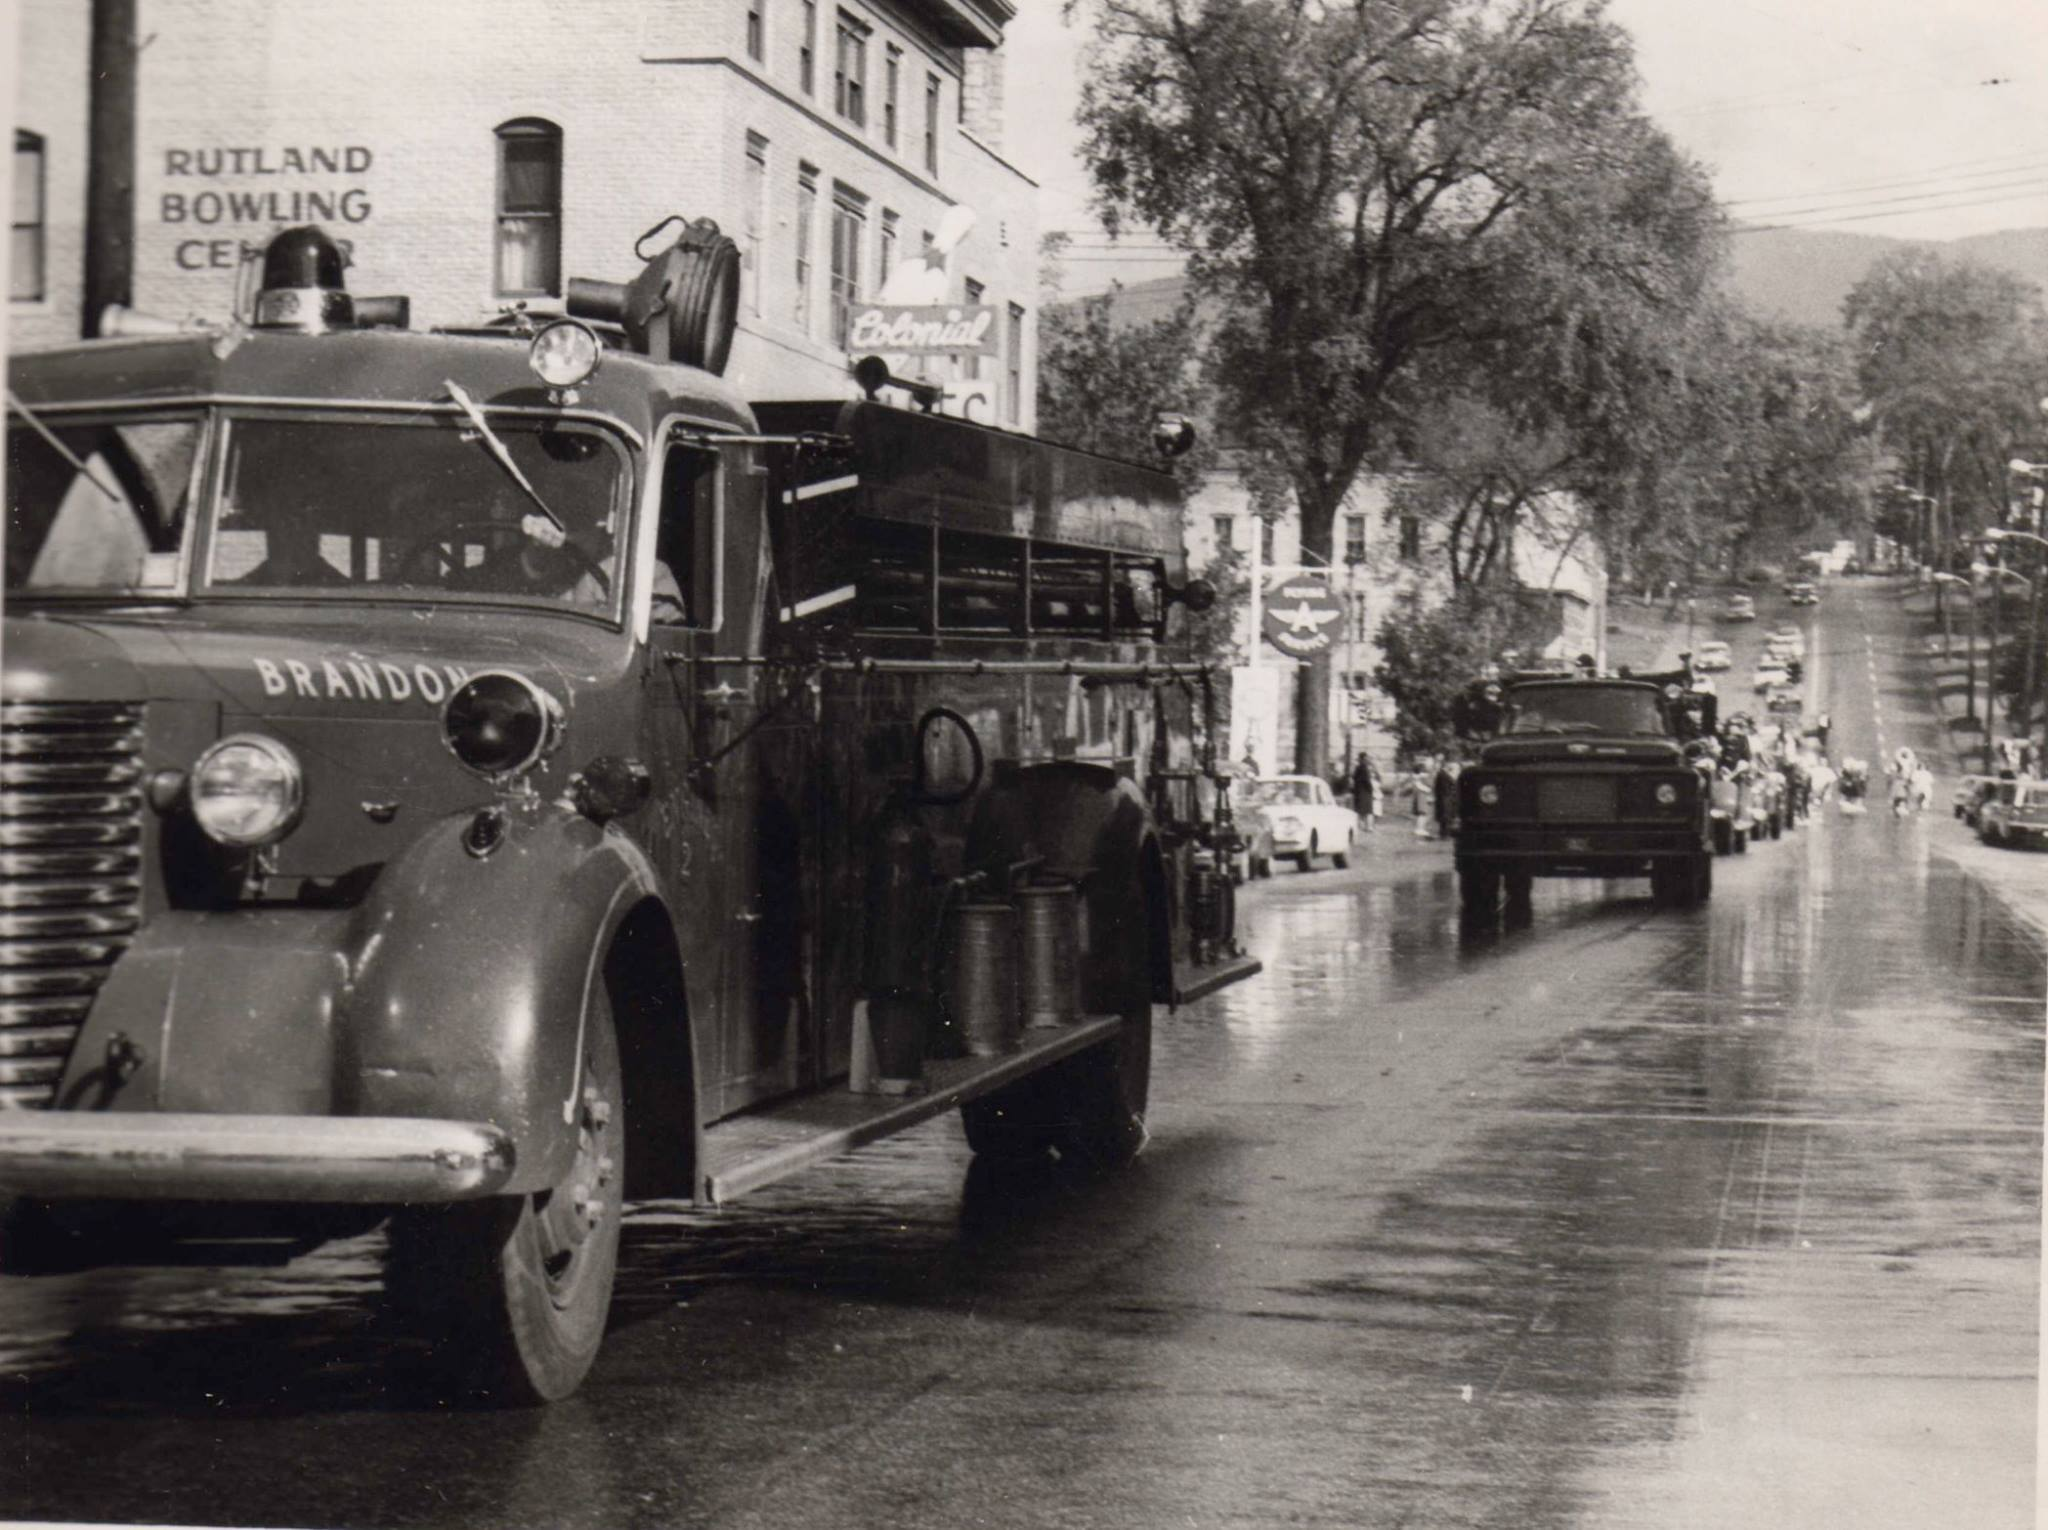 Rutland Parade, c. 1960s